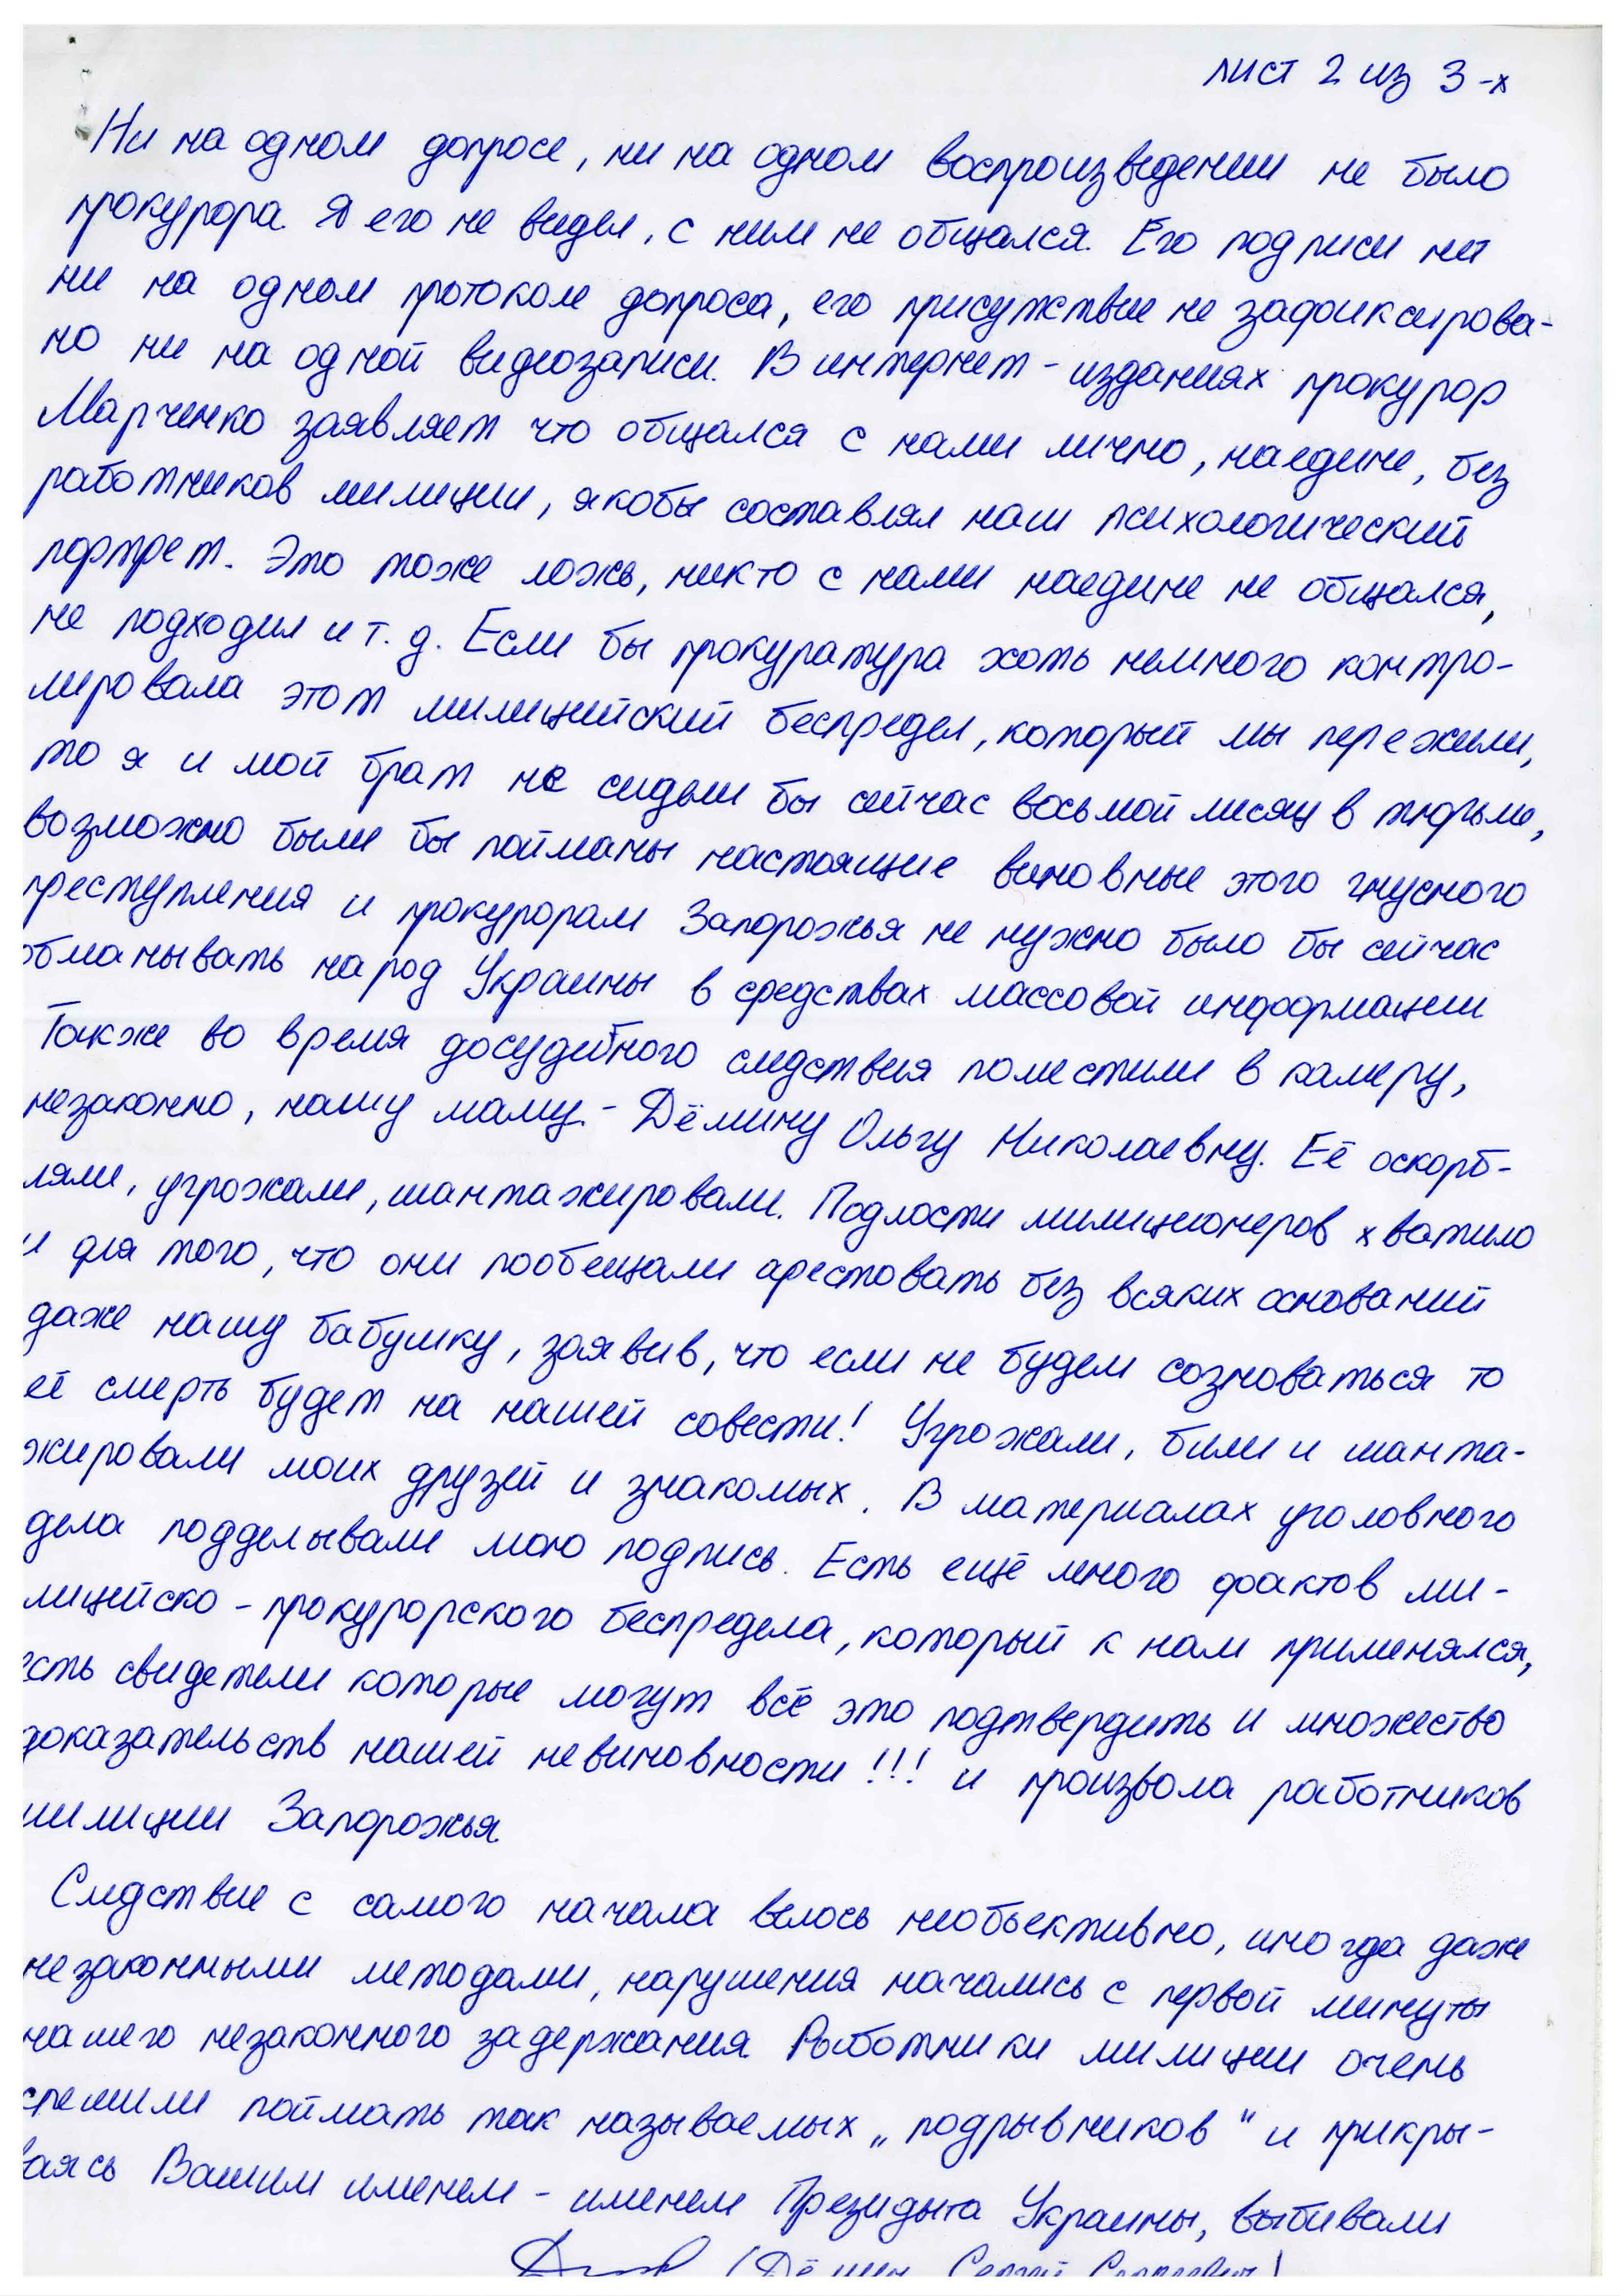 Сергей Демин: путём угроз, шантажа, физического насилия заставляли писать нас явки с повинной (фото)